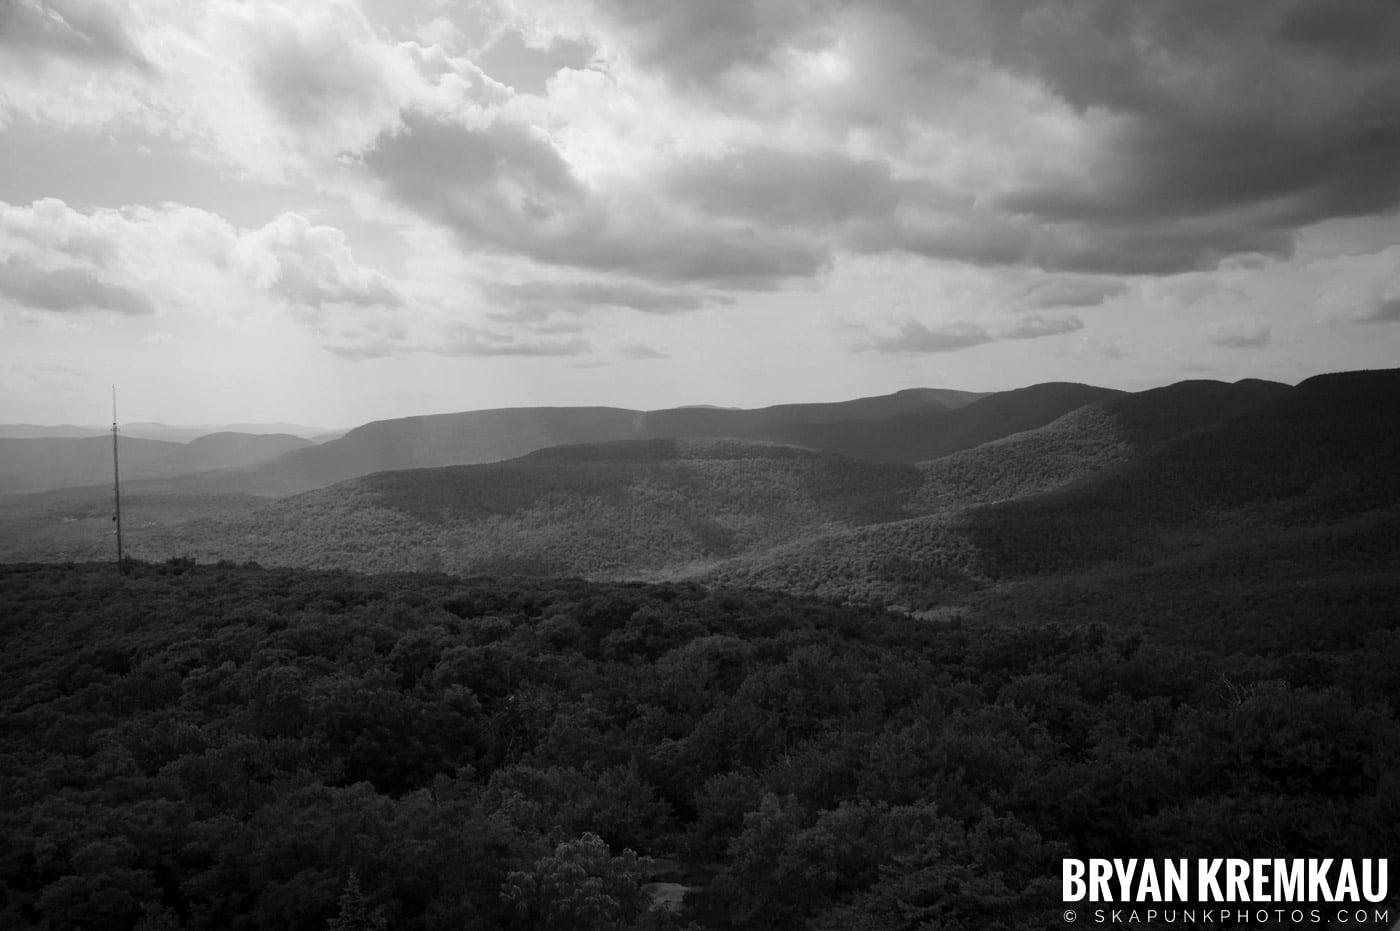 Catskills Overlook Mountain @ Woodstock, NY - 6.24.07 (5)